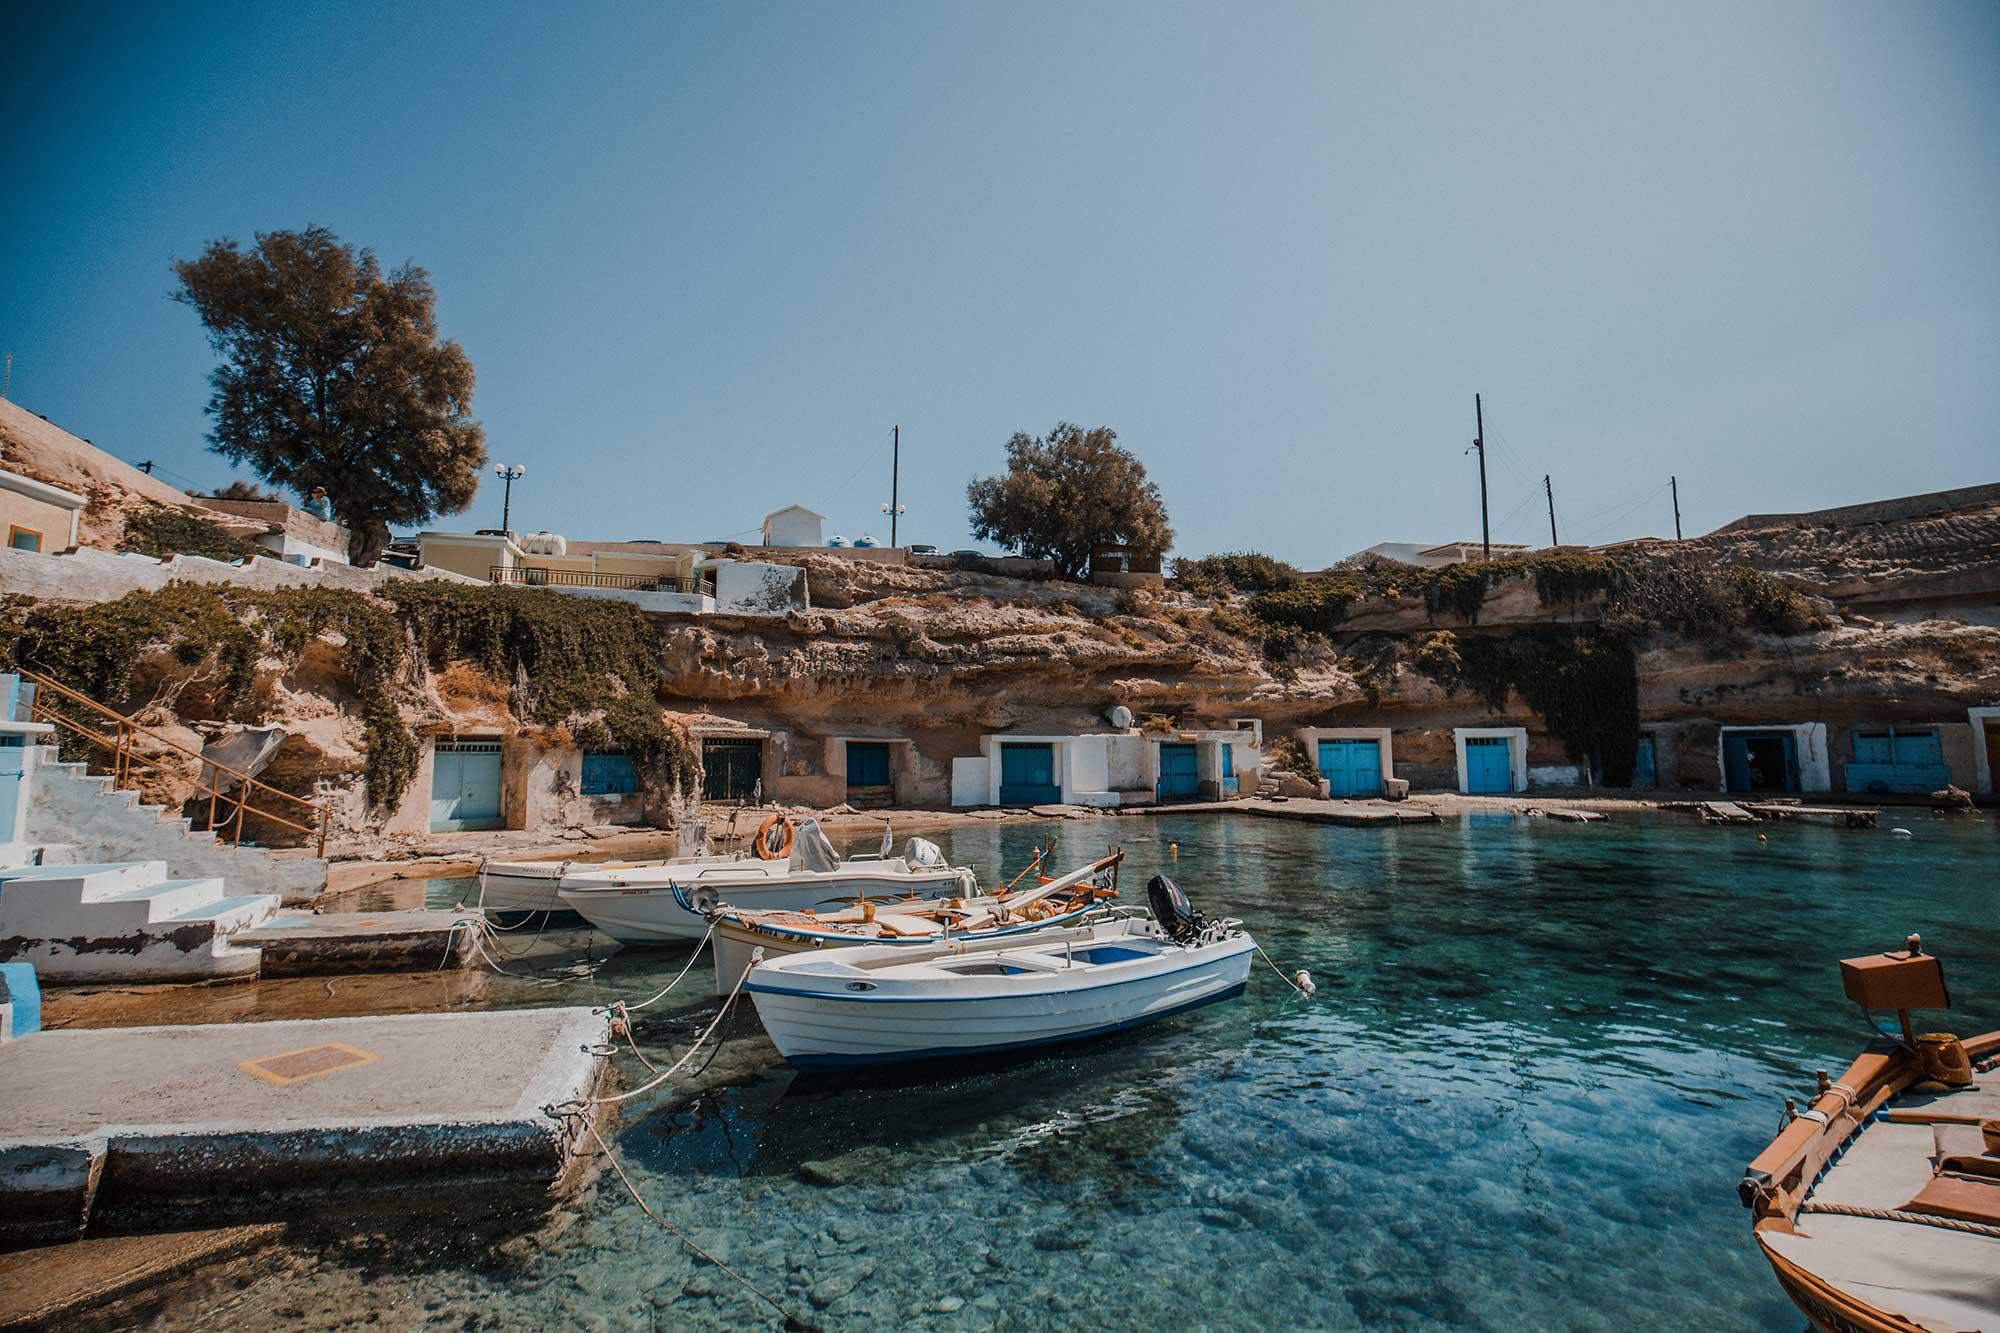 7 Best Beaches in Milos Greece | Milos Beach Guide - Dana Berez Greece Travel Guide. Mandrakia Beach Greece